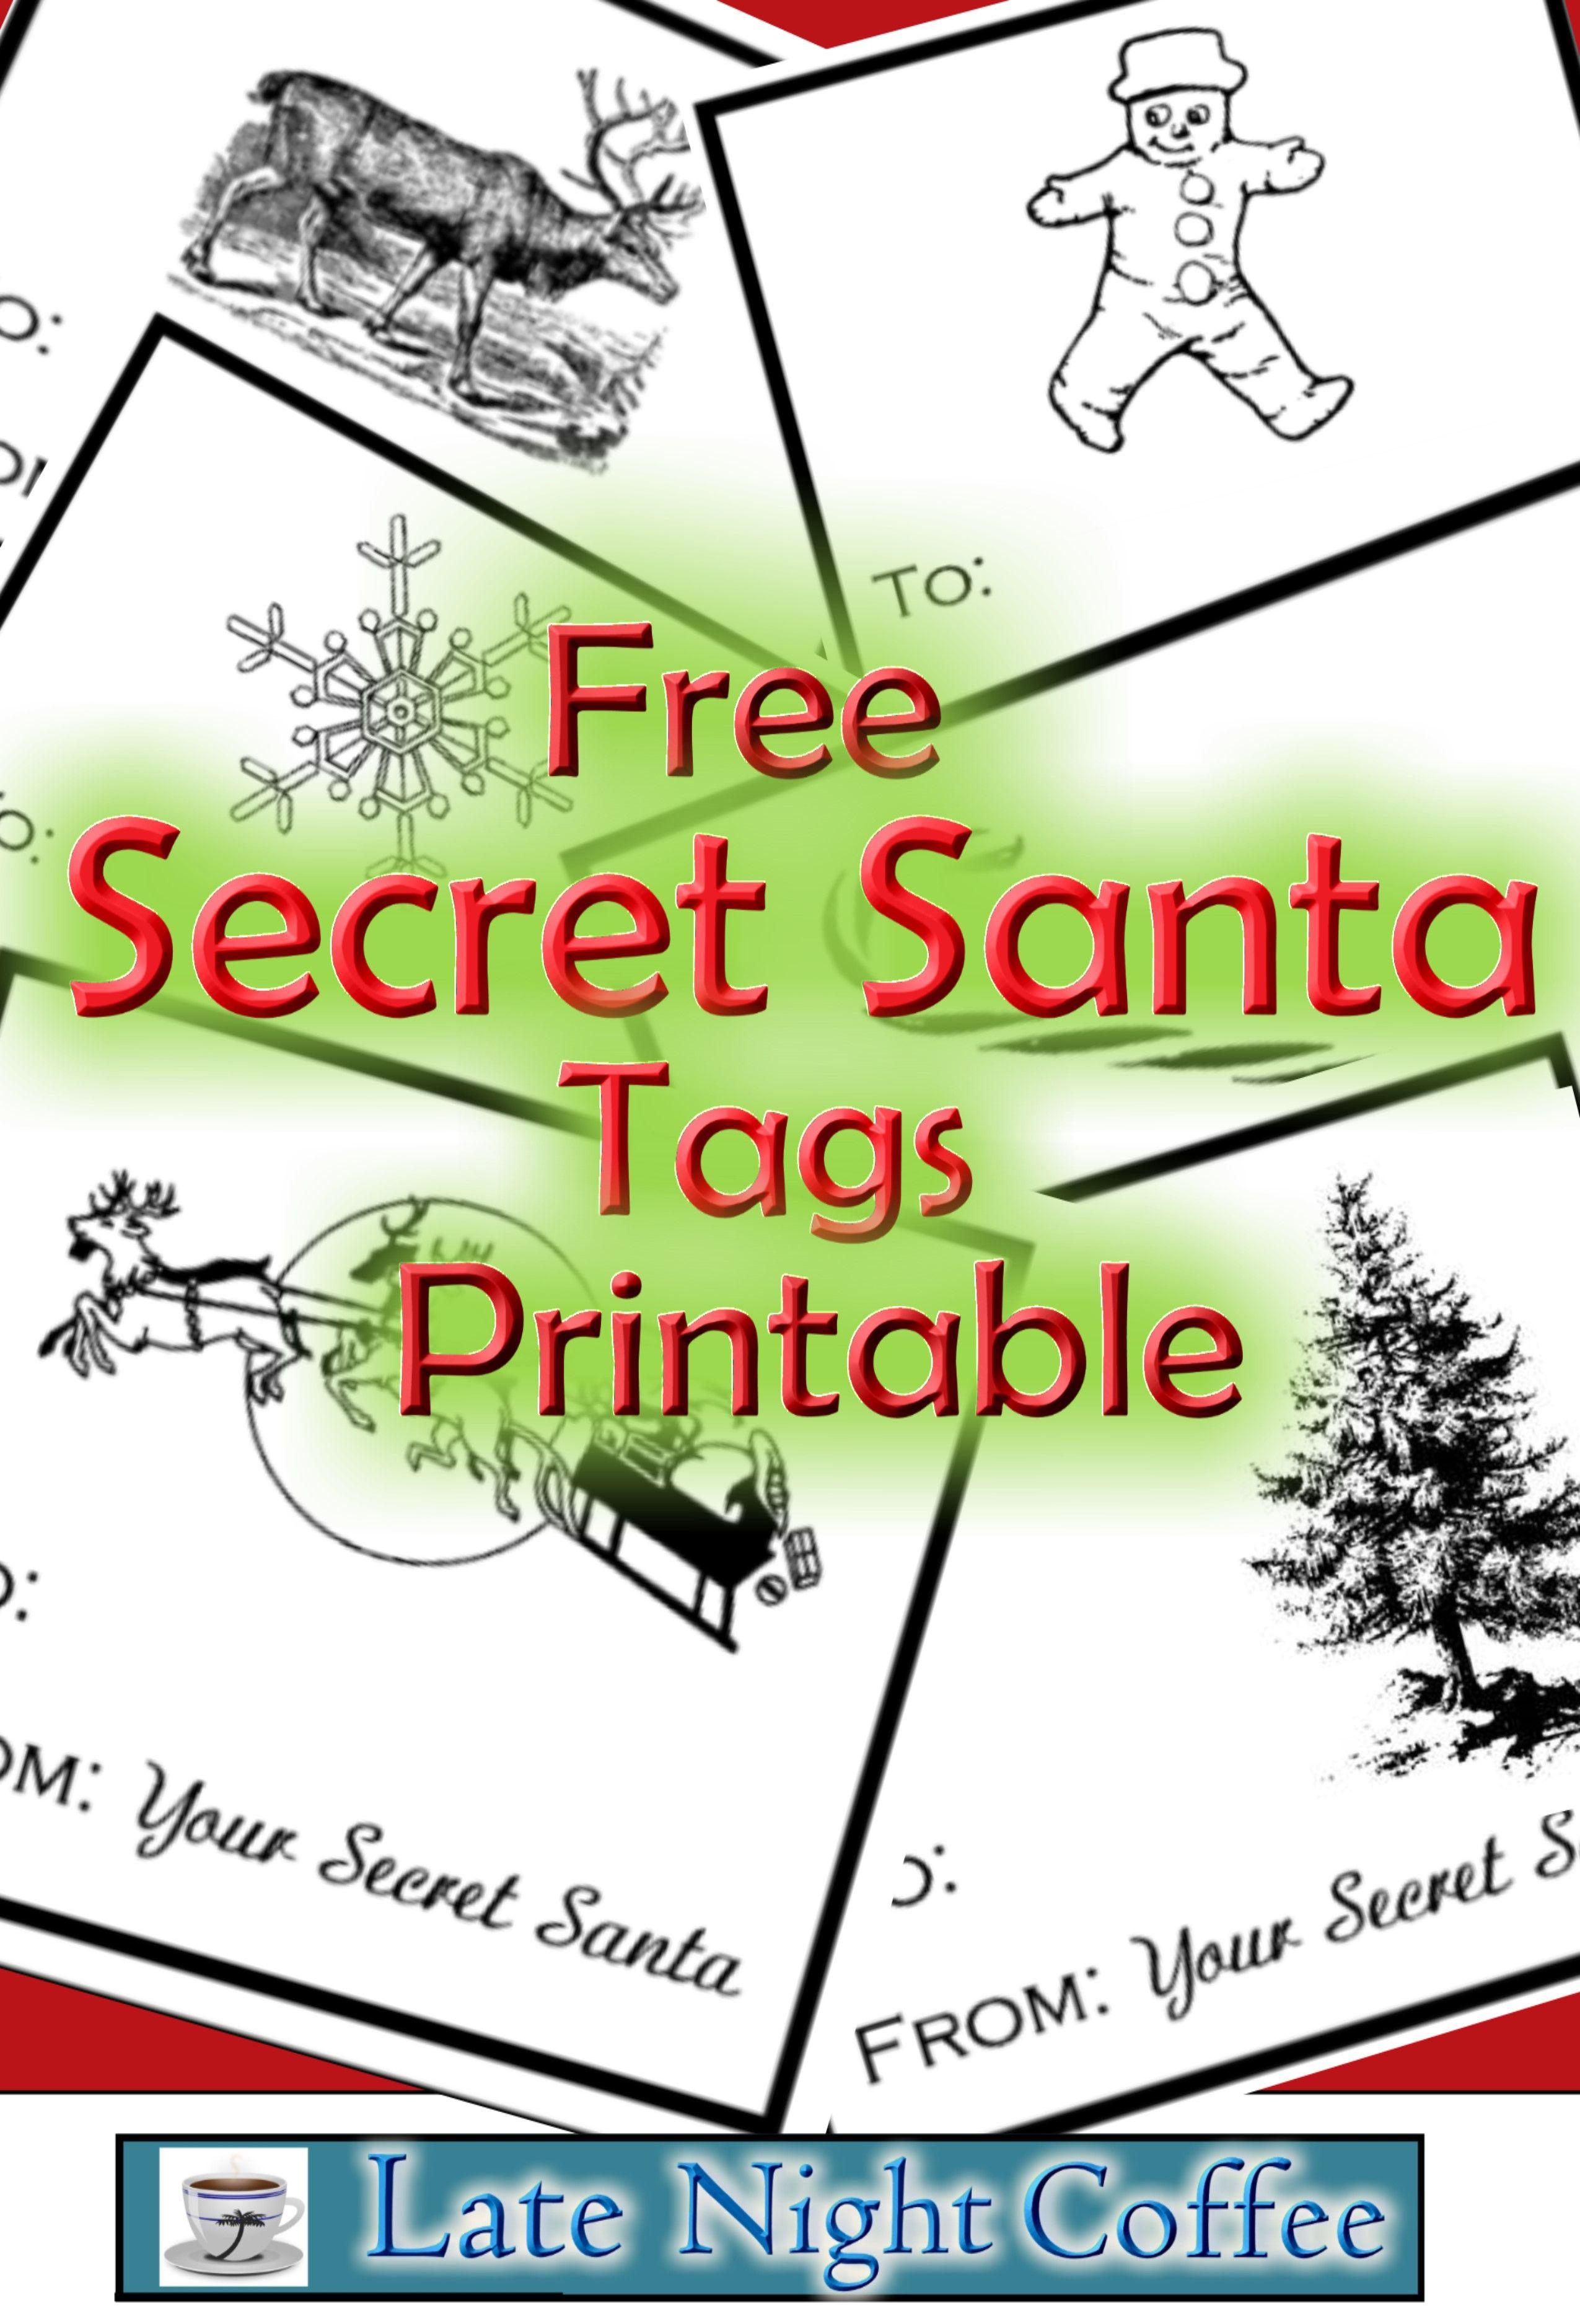 Secret Santa Tags Printable Free